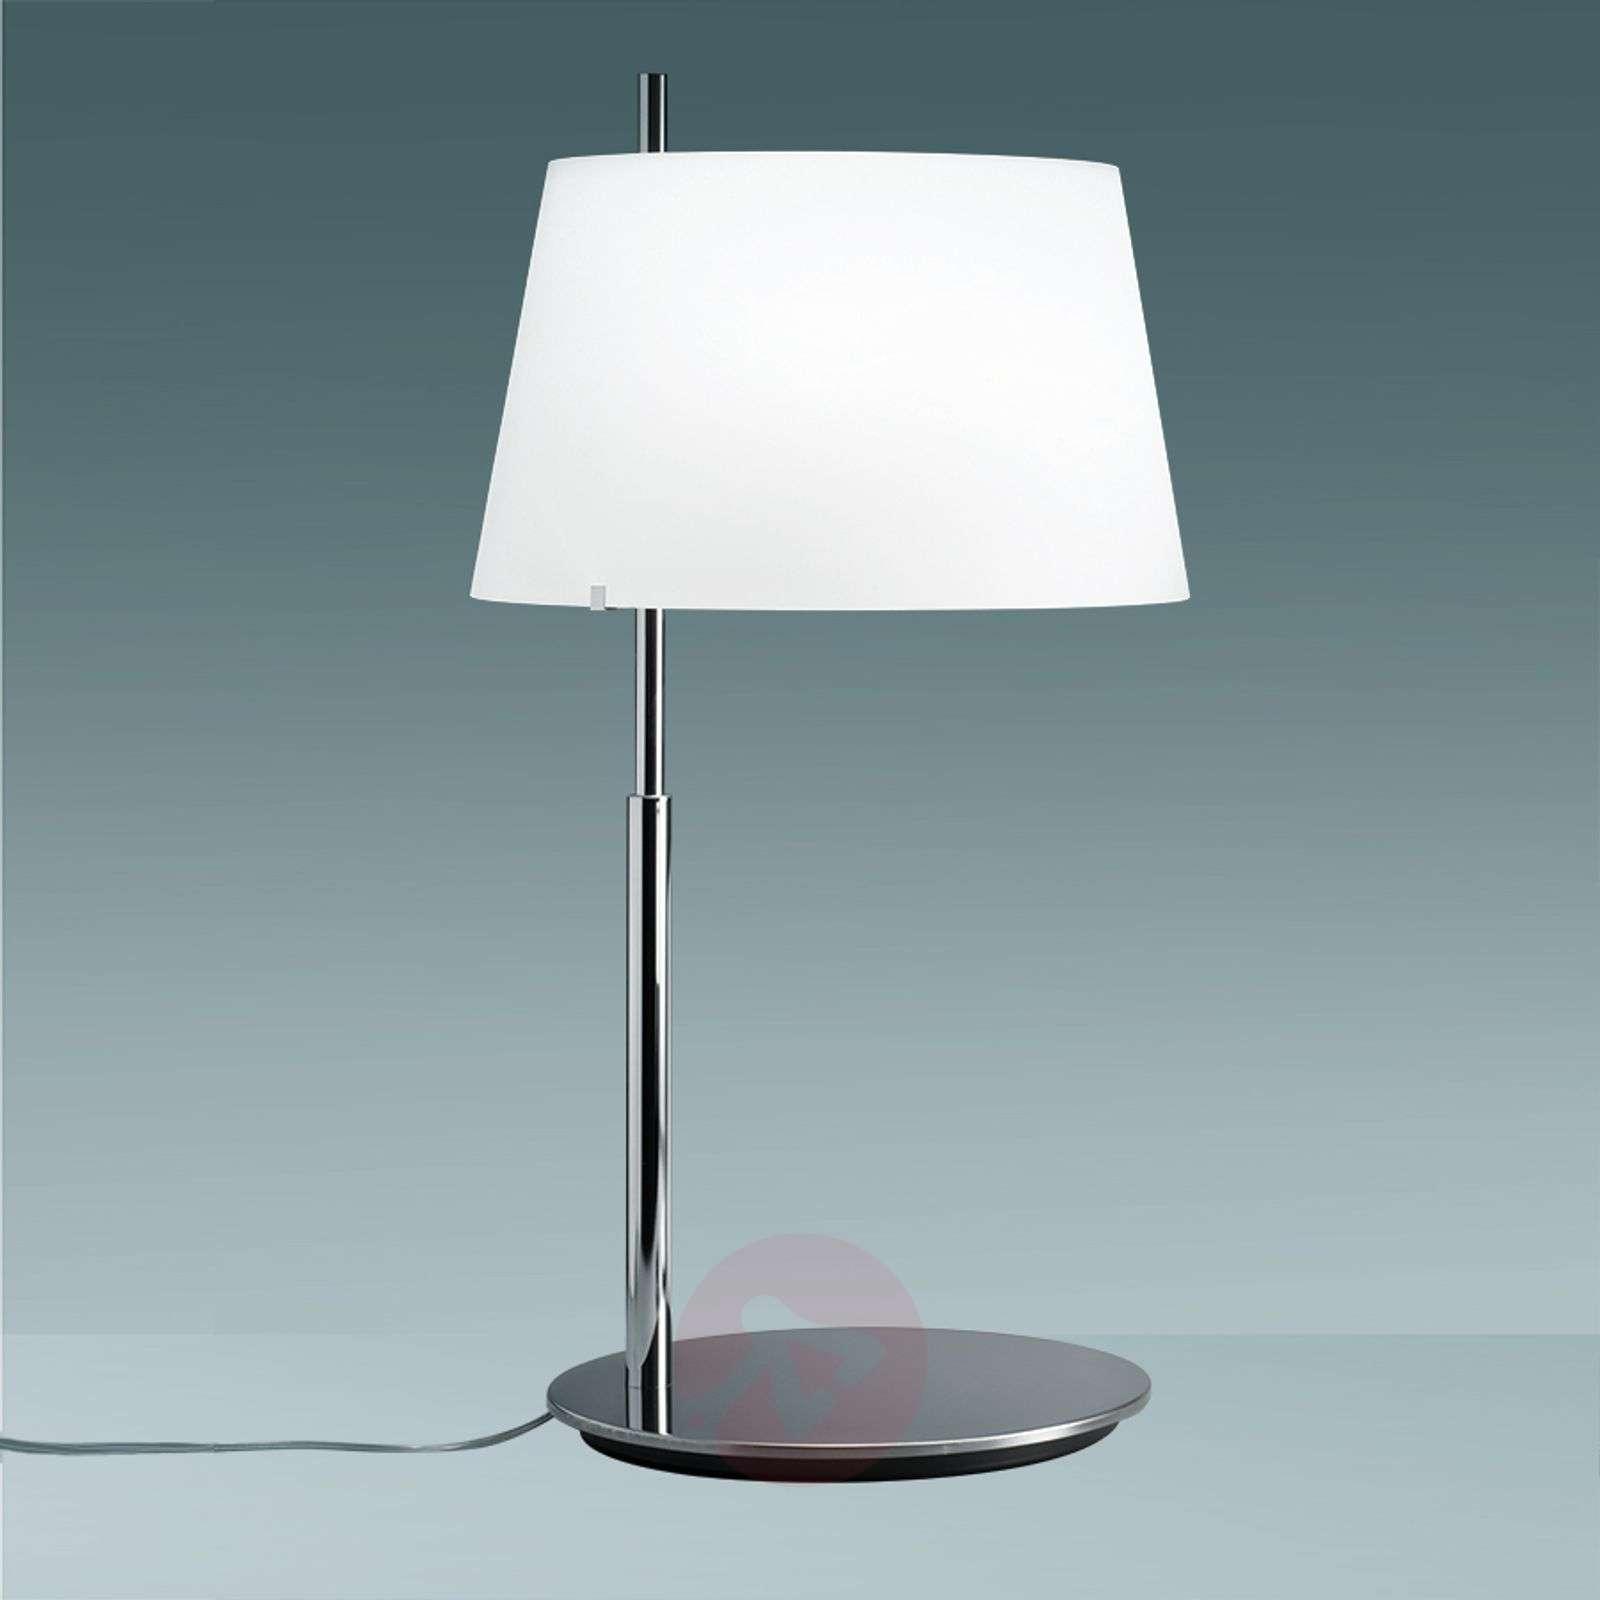 Exquisite table lamp Passion-3520169X-03